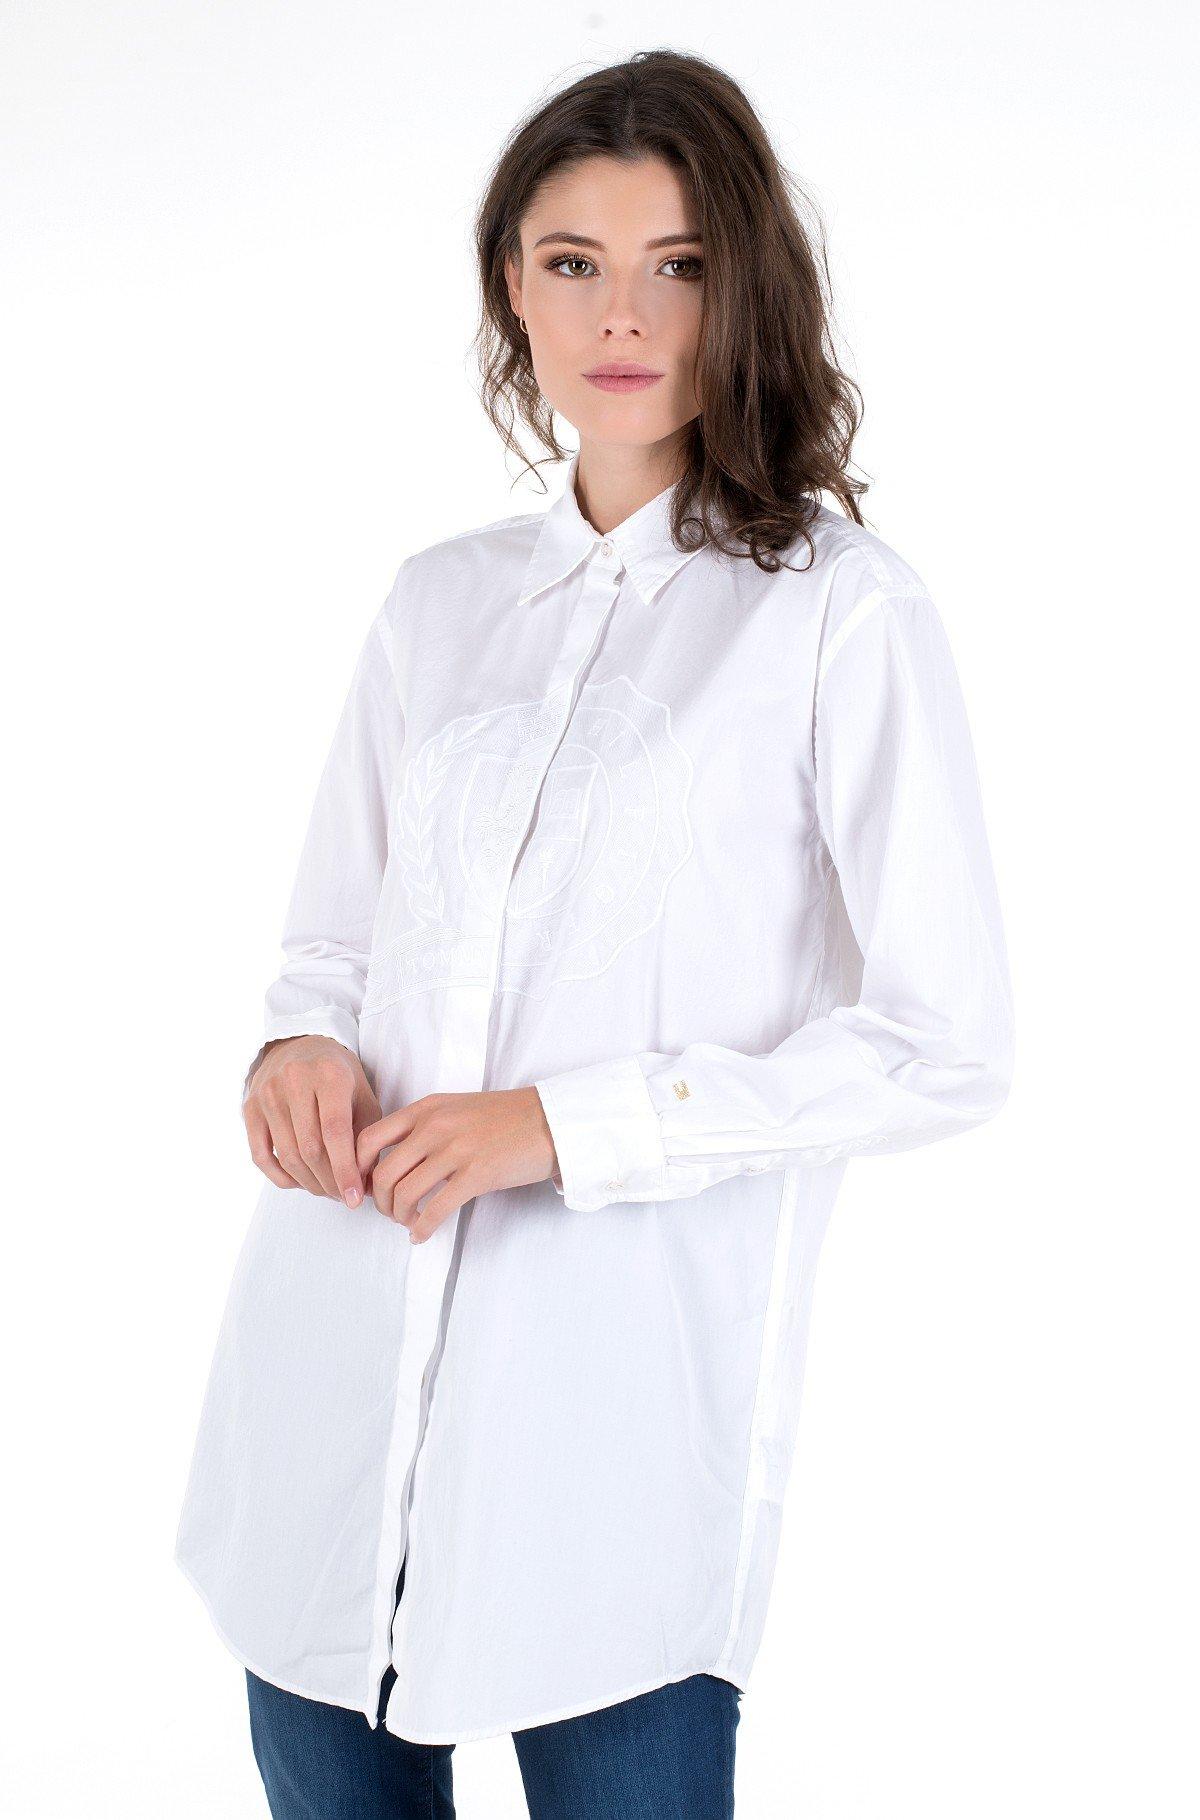 Marškiniai ICON TEDDY SHIRT LS W5-full-1